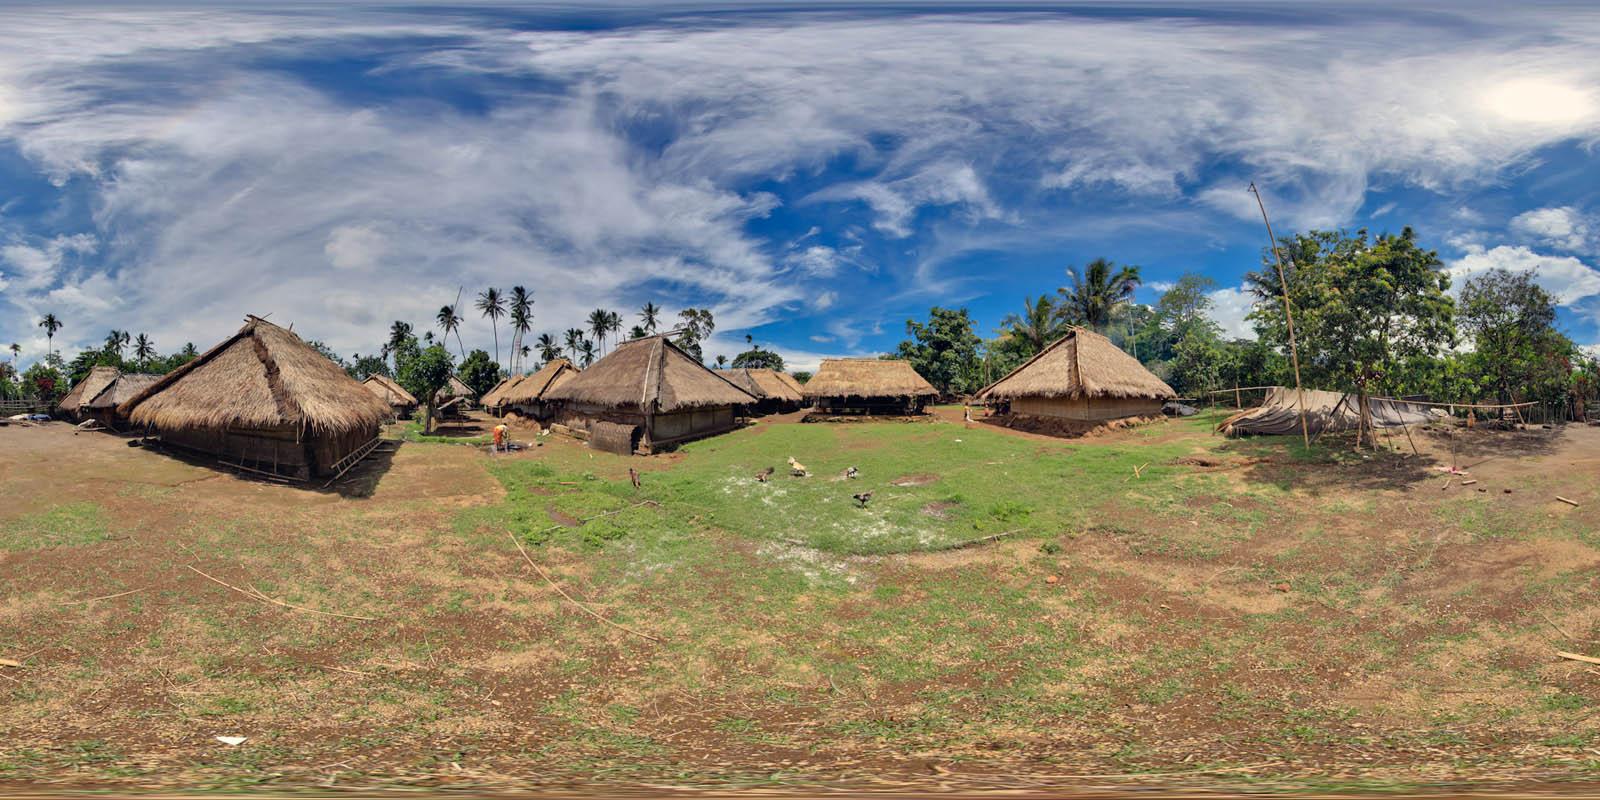 218 Liburan Akhir Pekan Desa Wisata Senaru Lombok Utara Kab